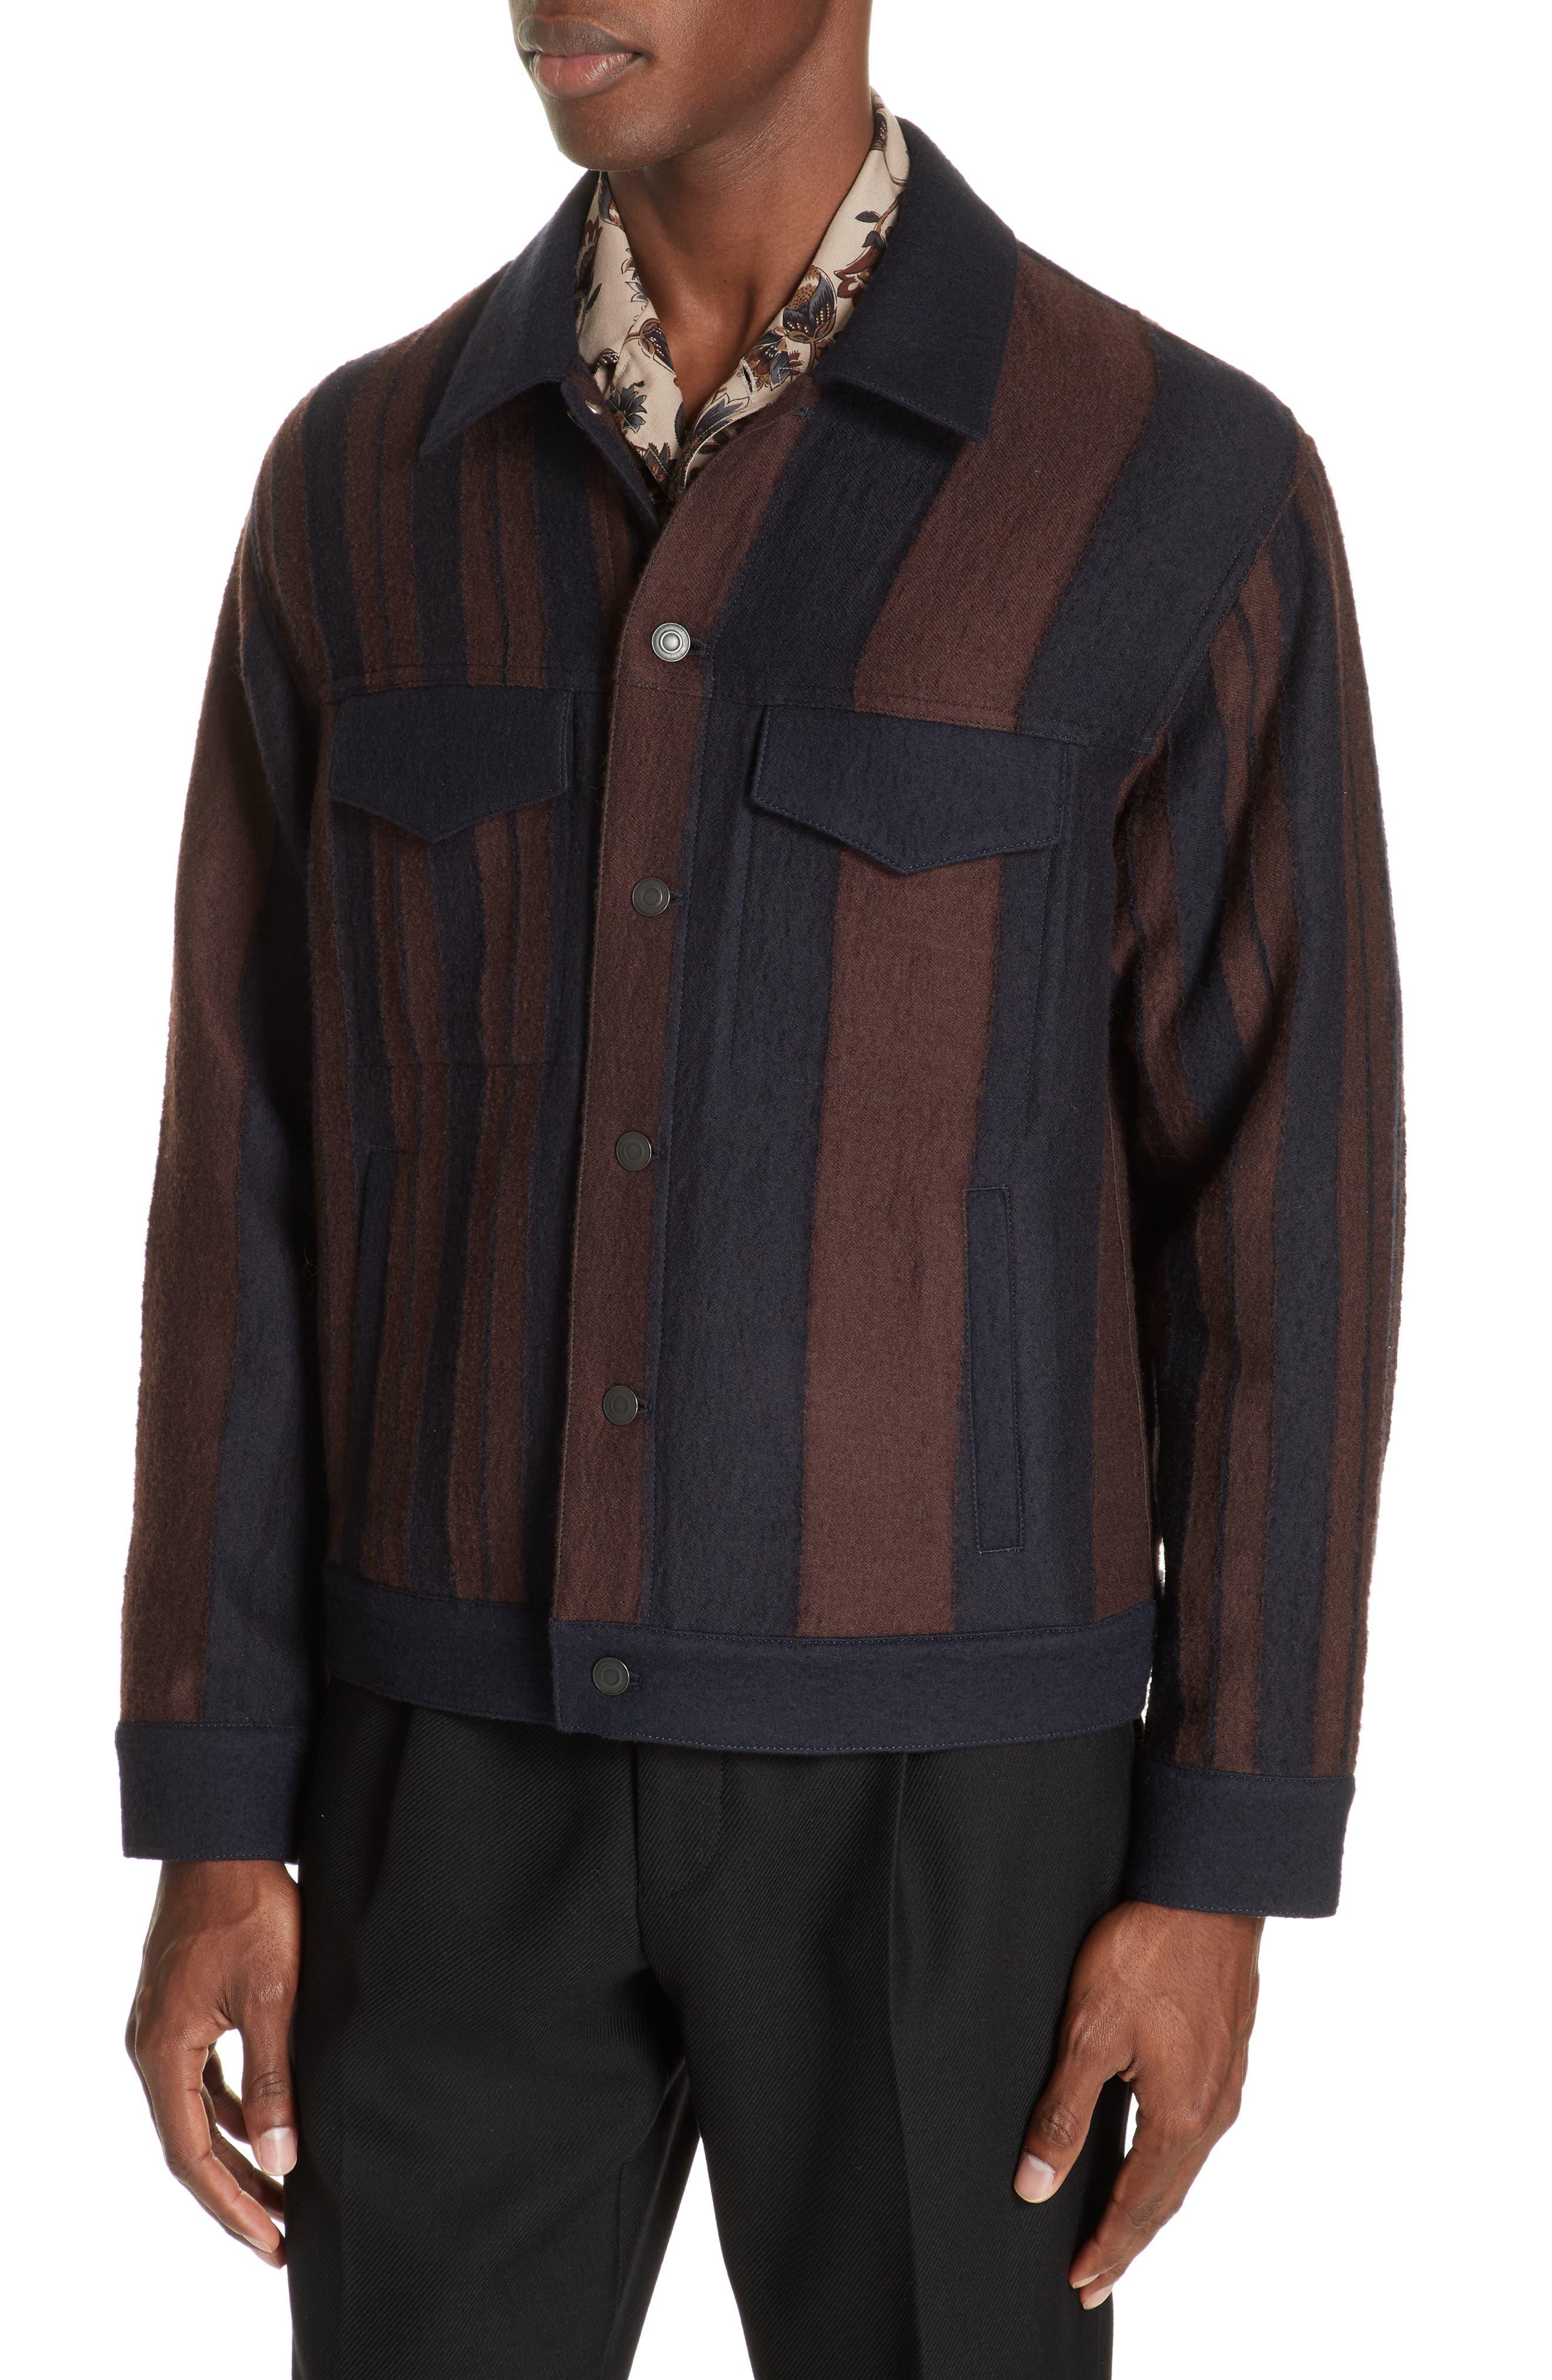 Stripe Wool Blend Jacket,                             Alternate thumbnail 4, color,                             001